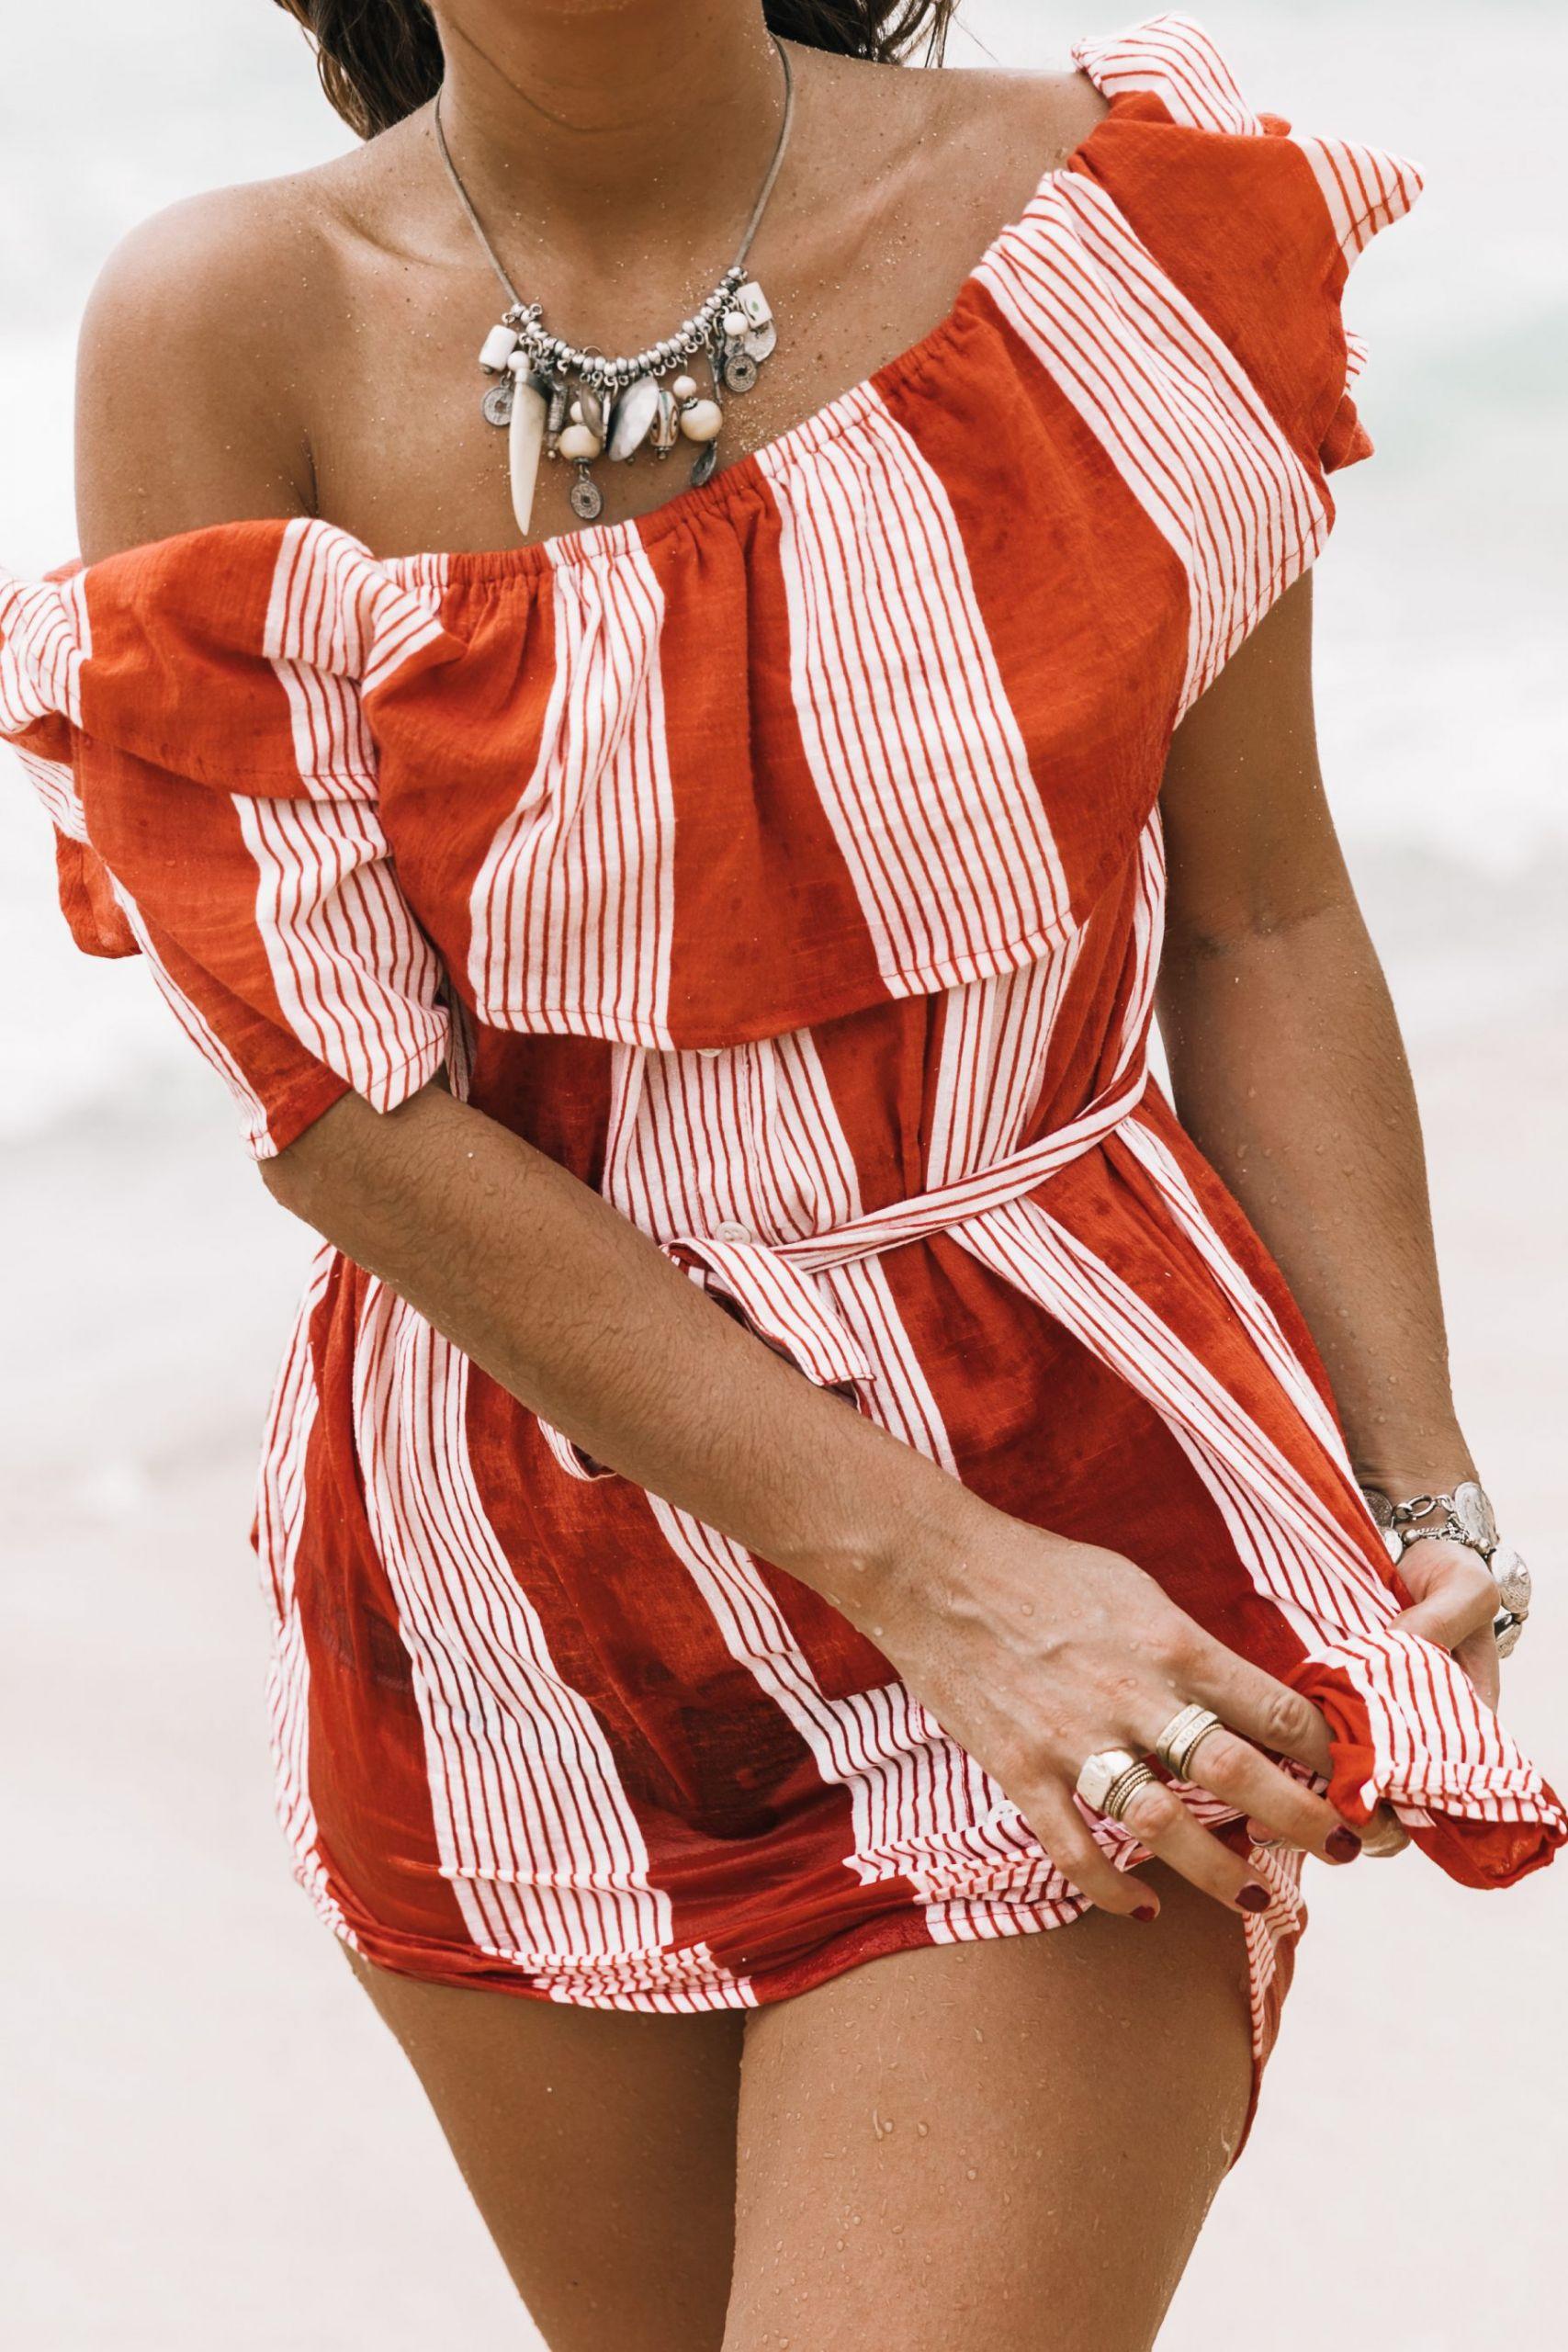 Bali-Uluwatu-Faithfull-Stripped_Dress-Off_The_Shoulders-Red_Dress-Straw_Hat-Espadrilles-223-1800x2700